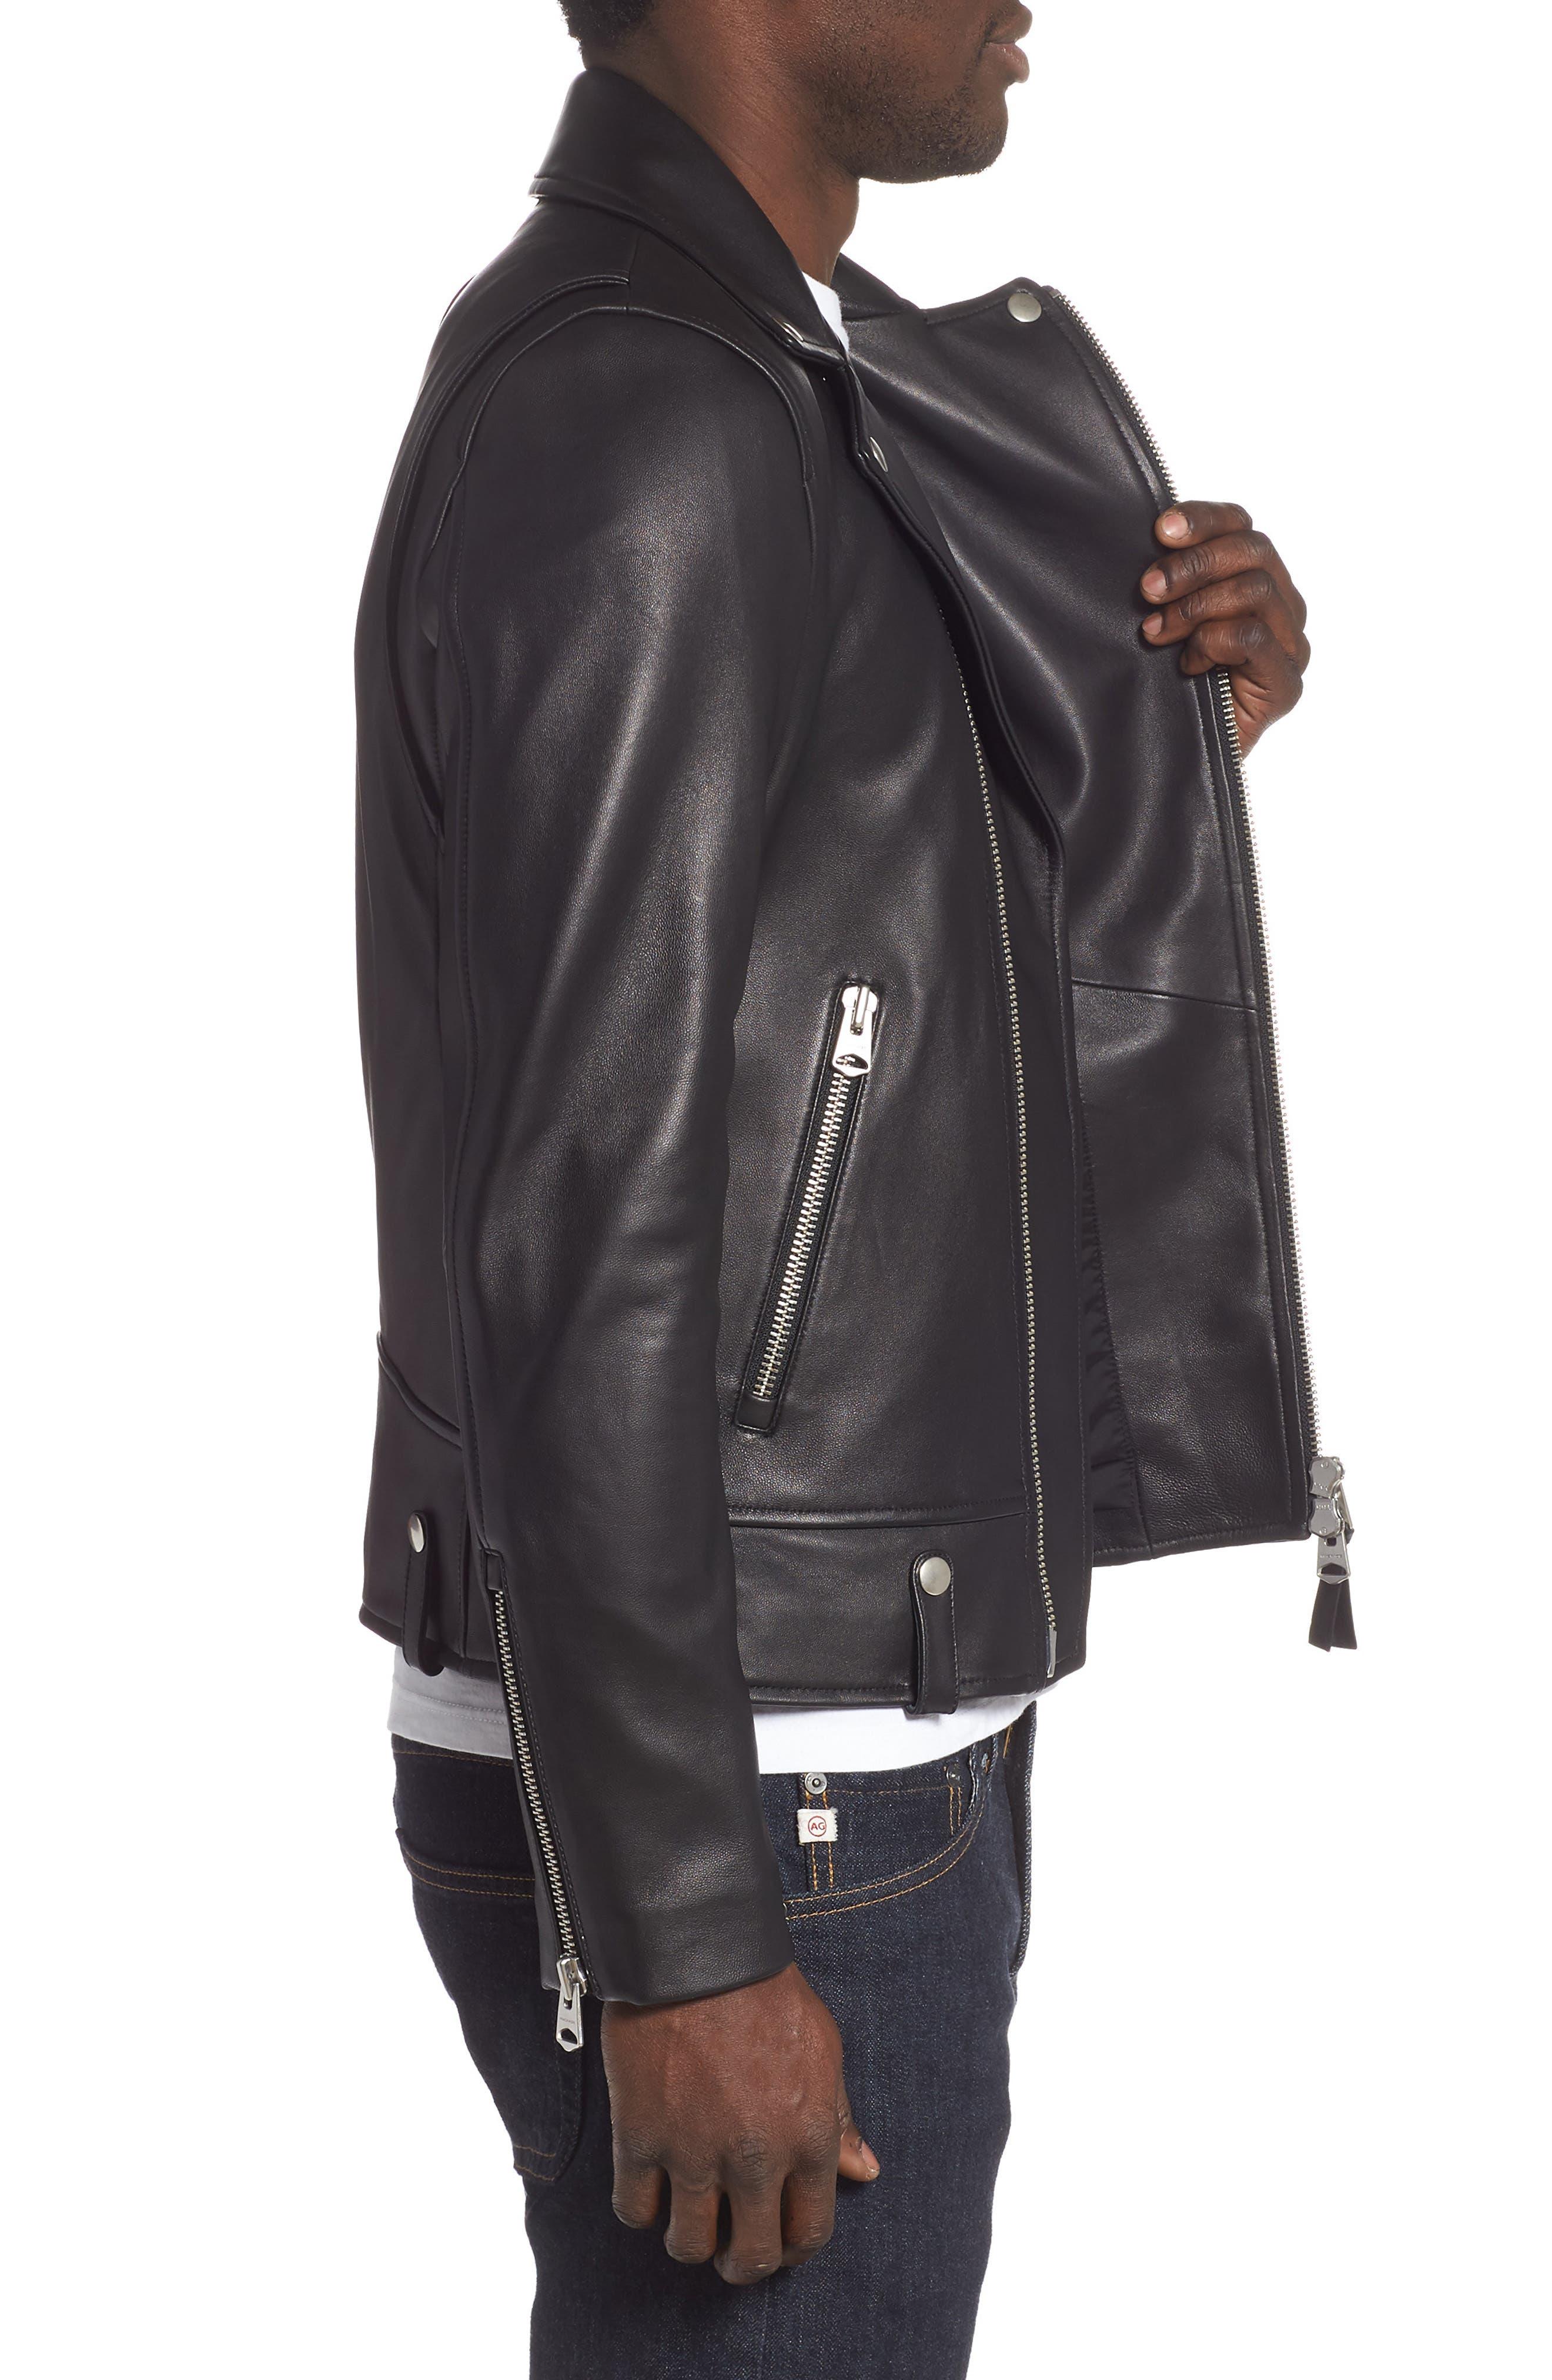 MACKAGE, Fenton Leather Moto Jacket, Alternate thumbnail 3, color, BLACK